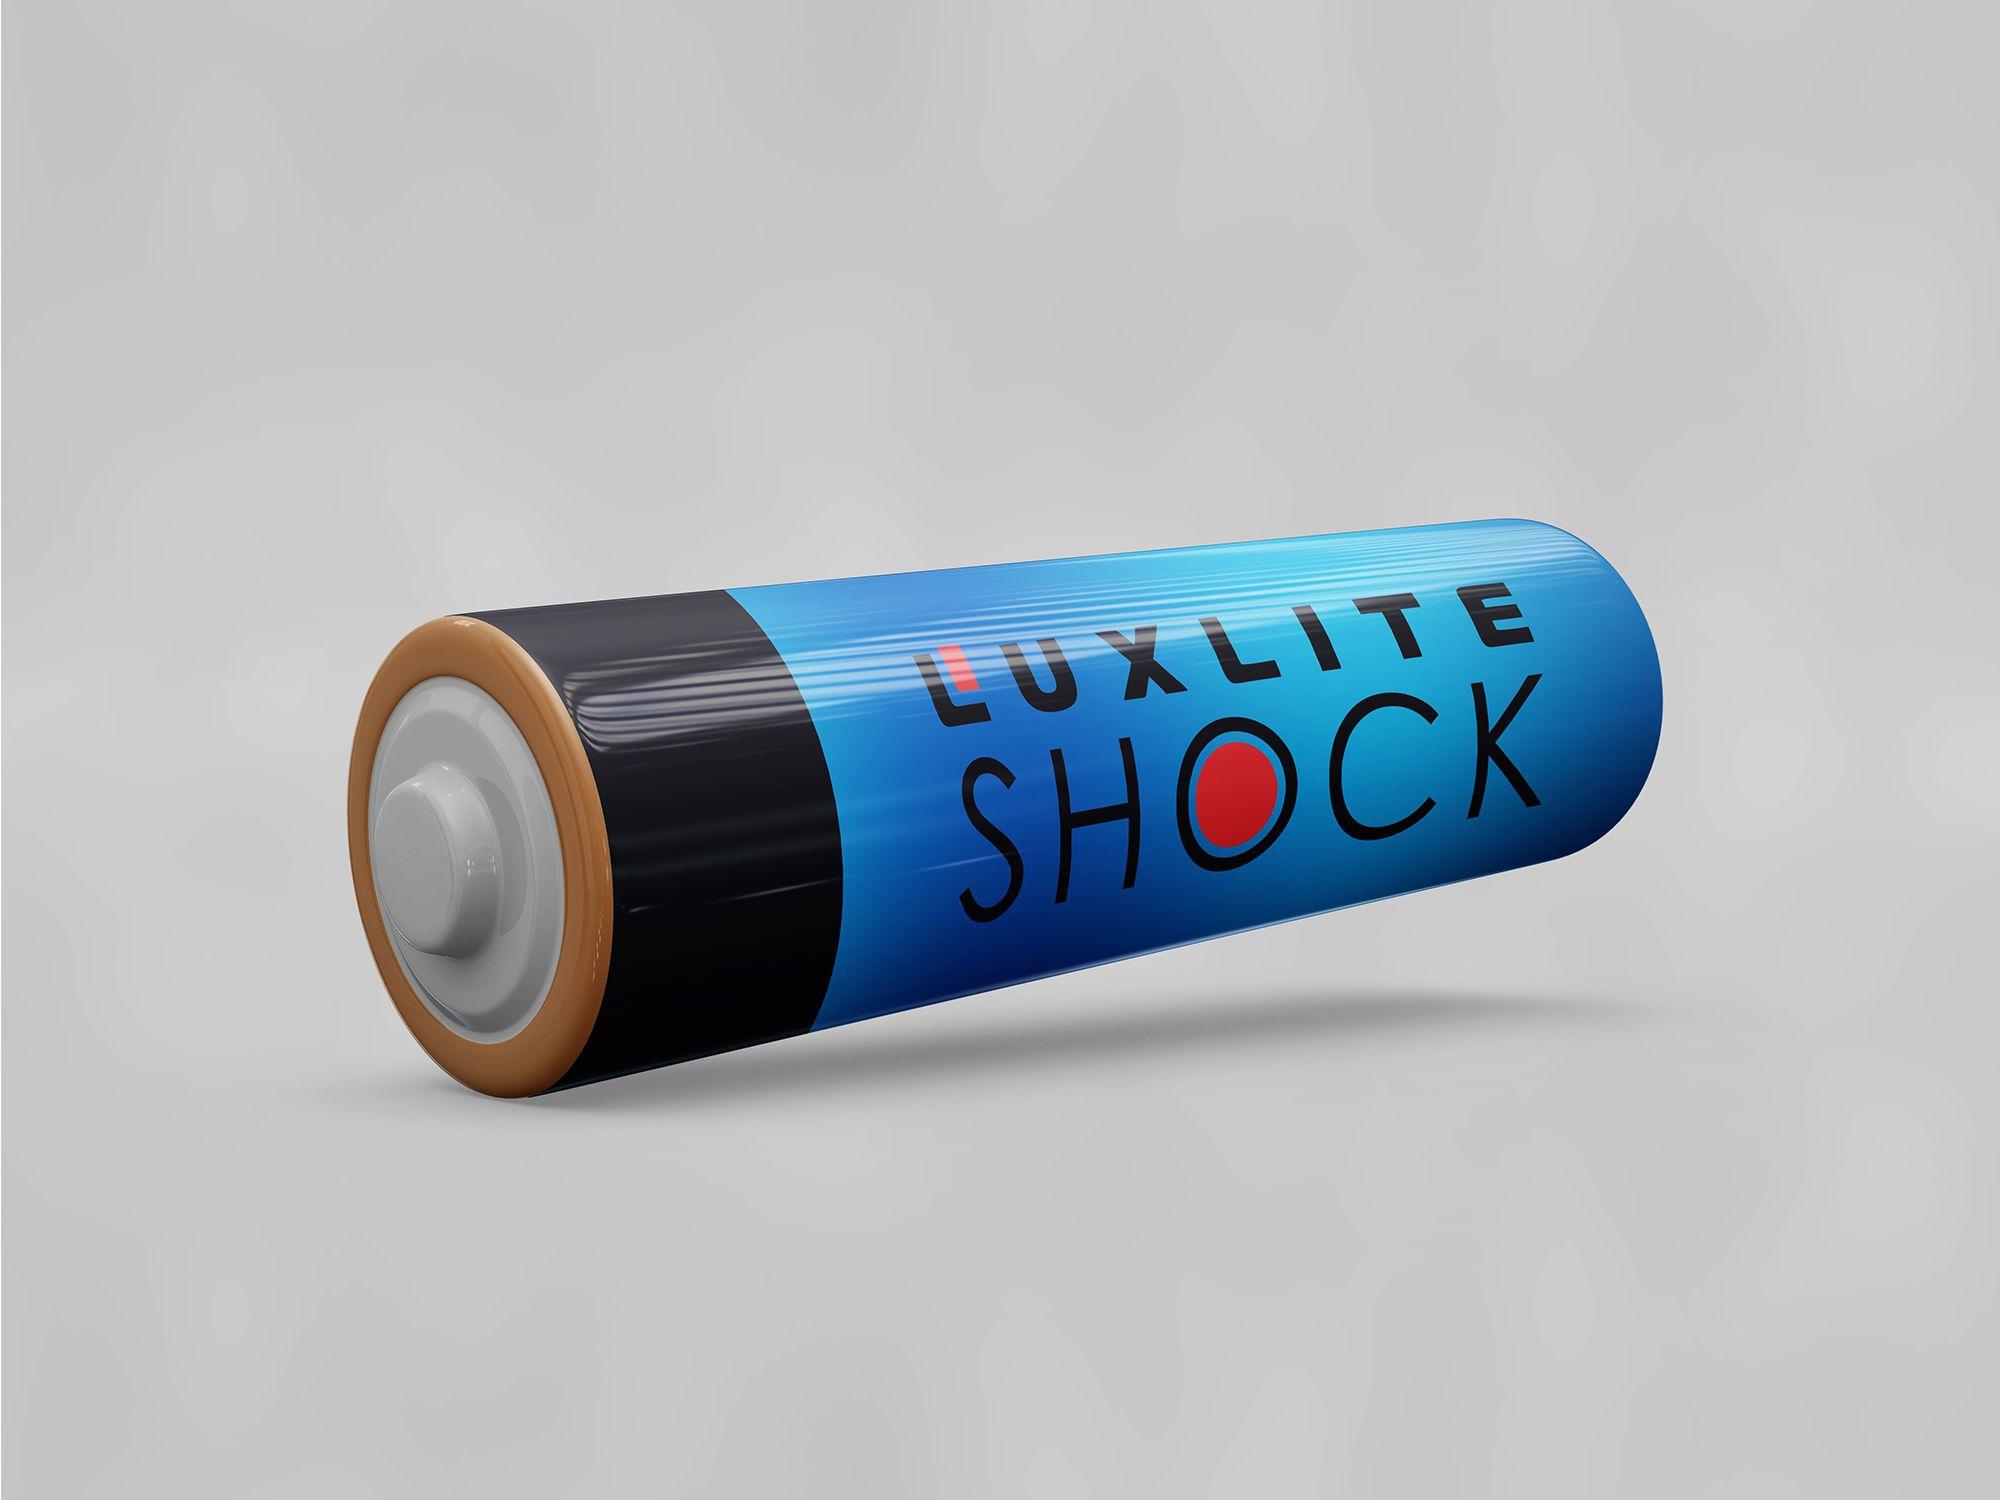 Логотип для батареек LUXLITE SHOCK - дизайнер ocks_fl